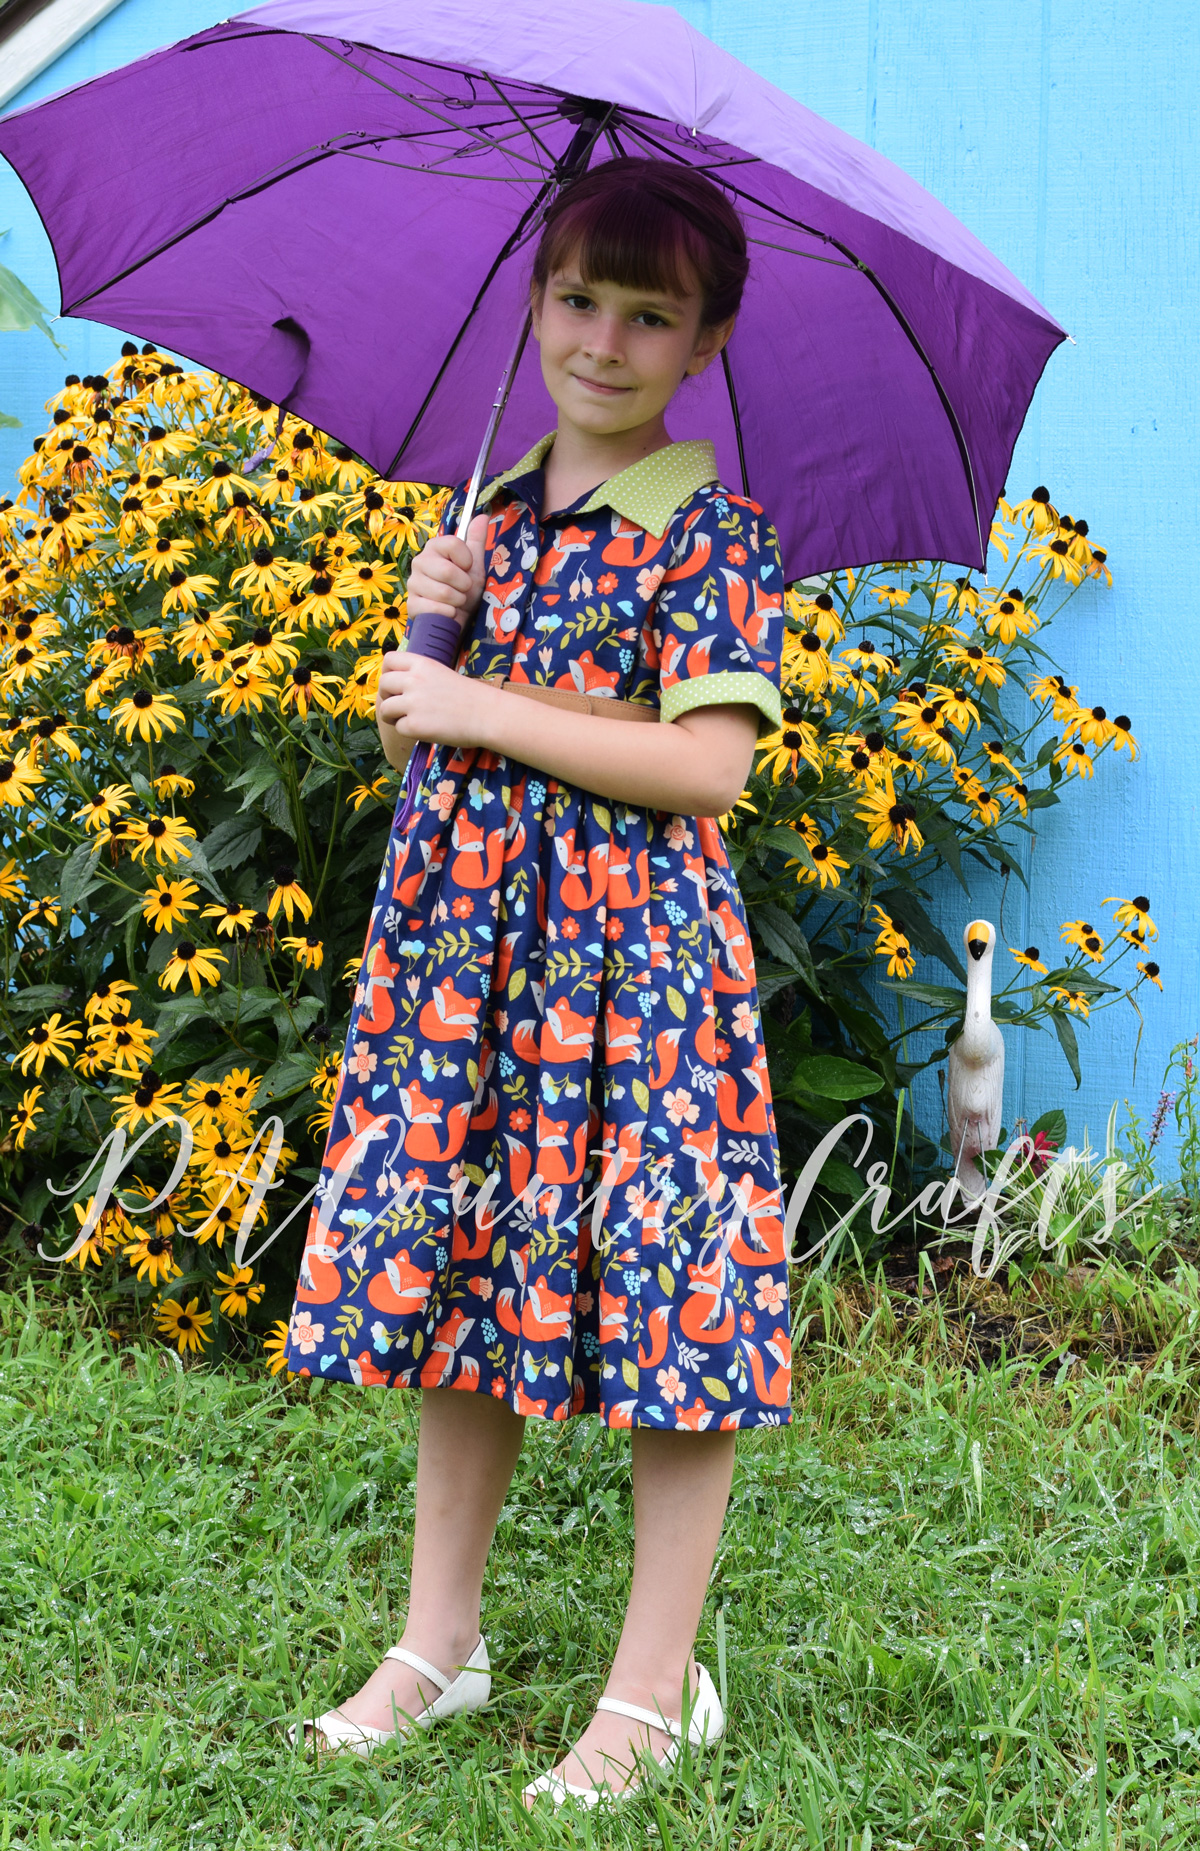 1950s style dress in cute, fox fabric!